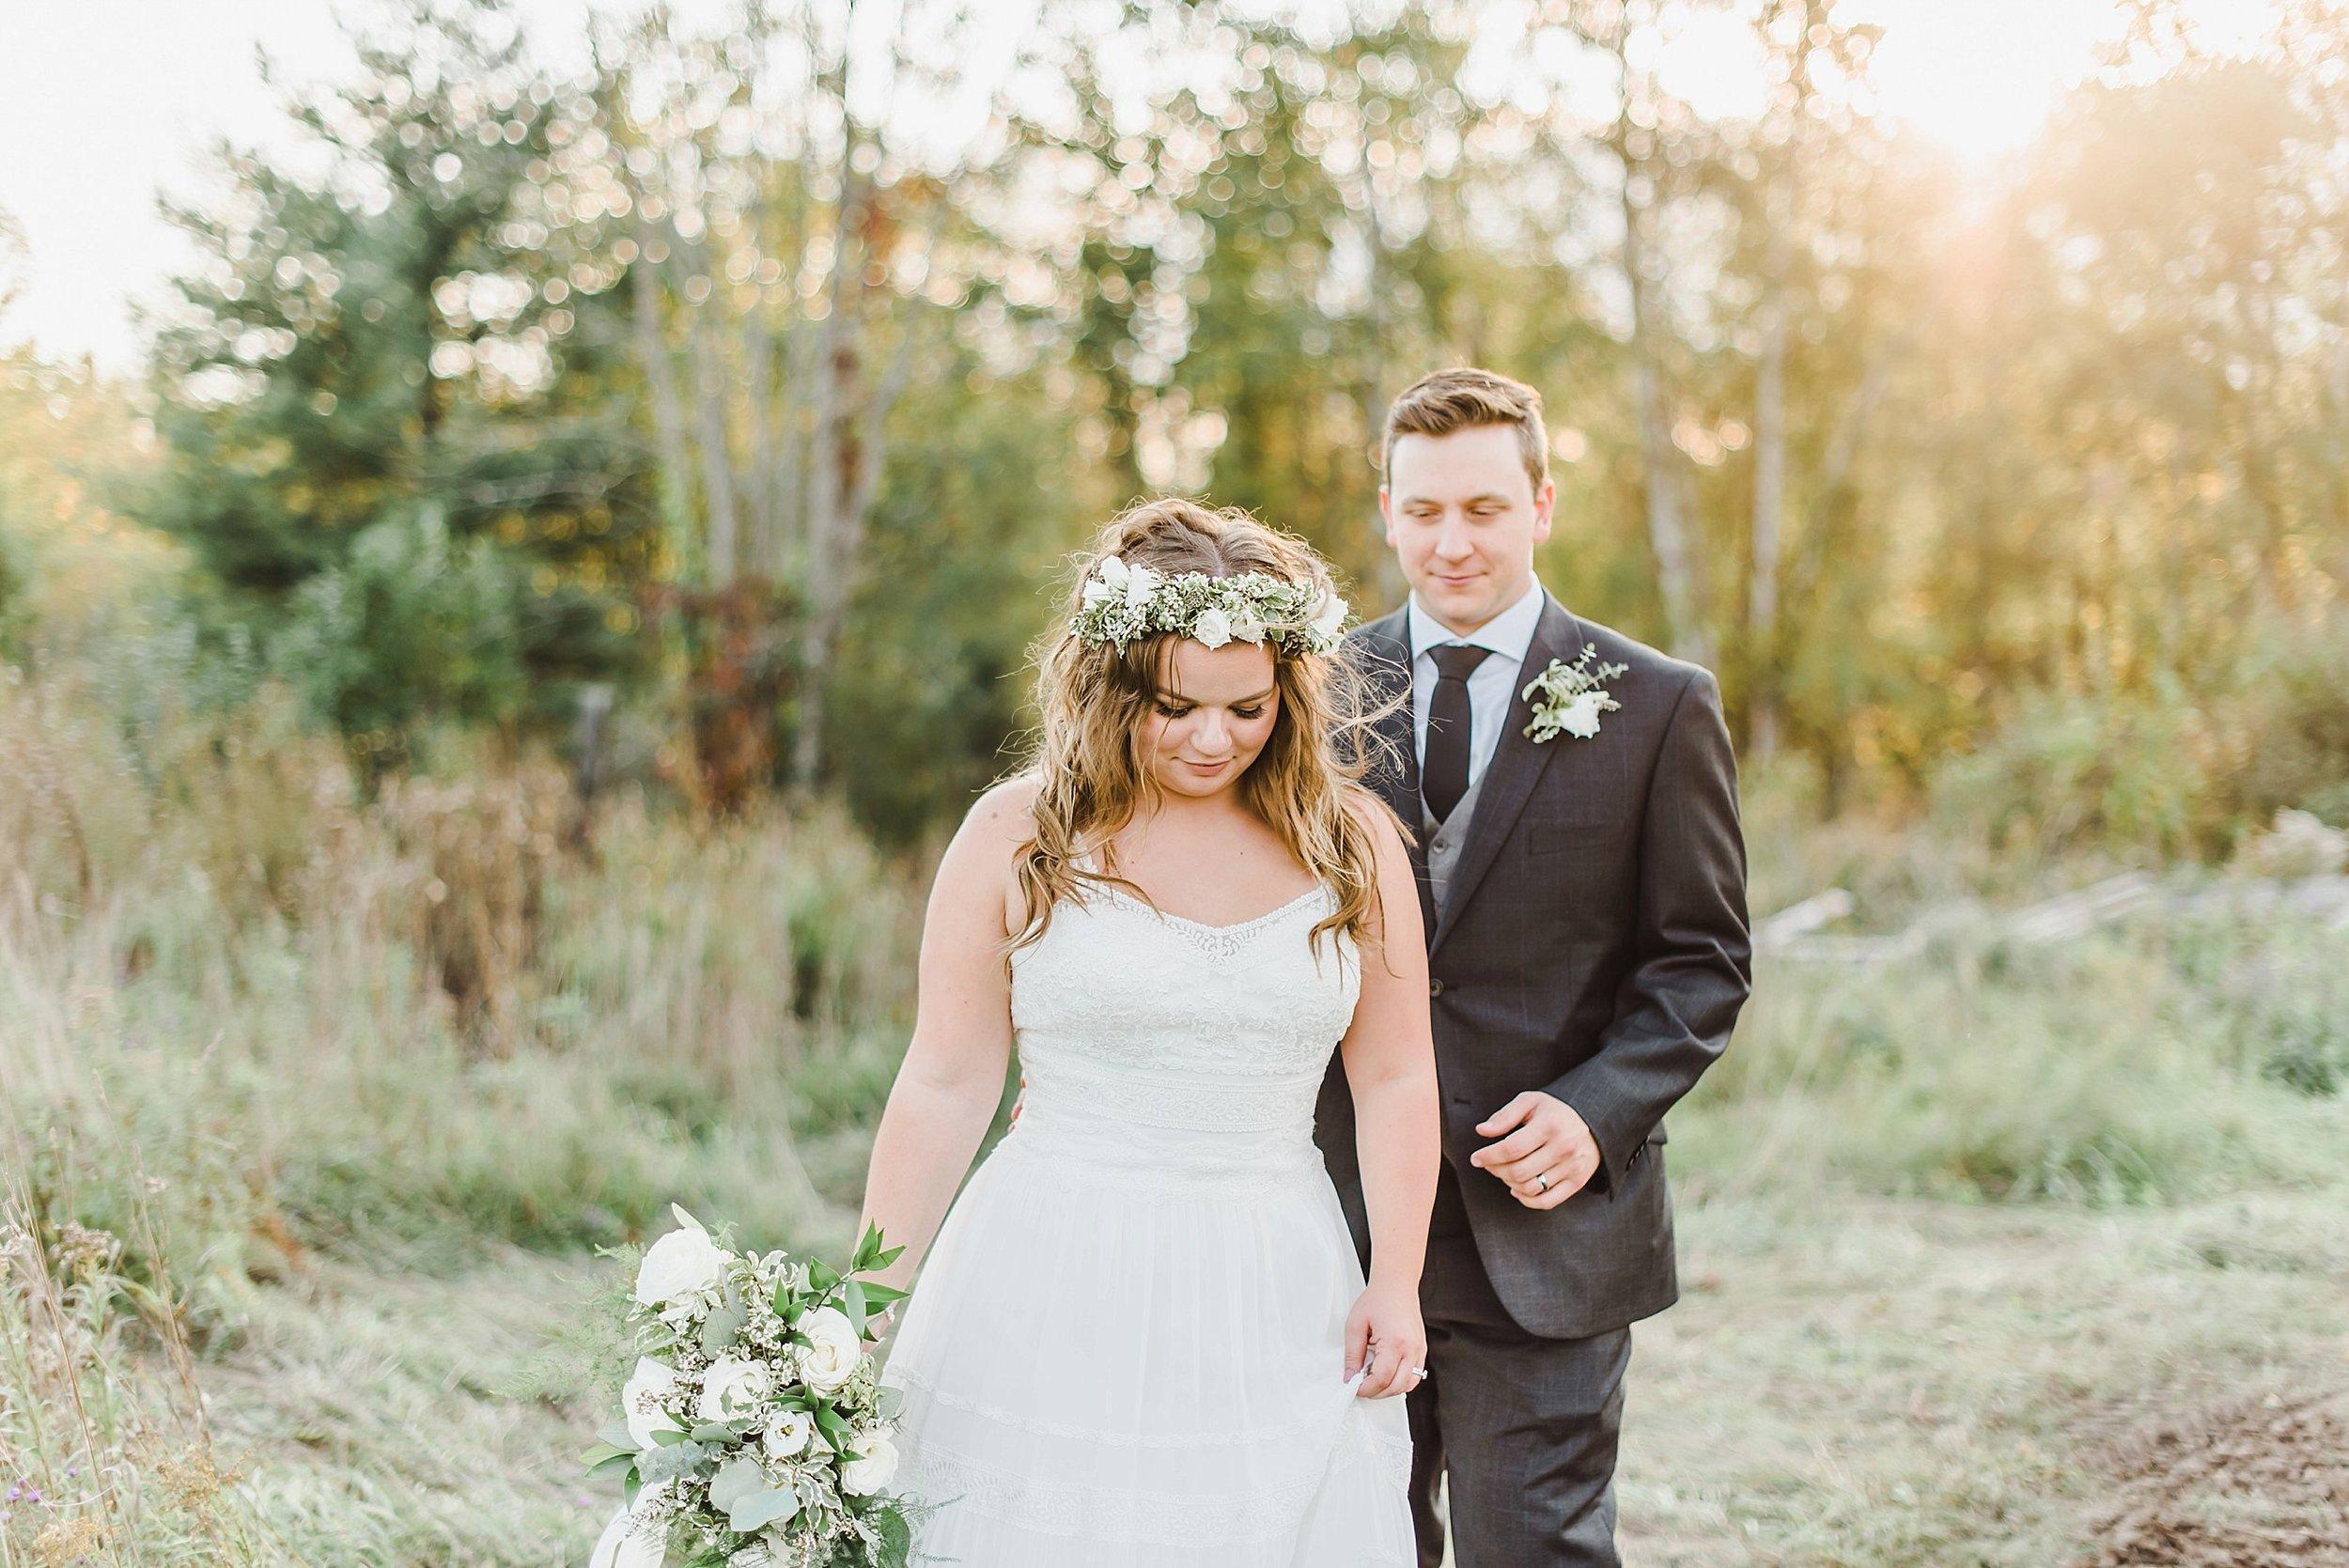 light airy indie fine art ottawa wedding photographer | Ali and Batoul Photography_1202.jpg